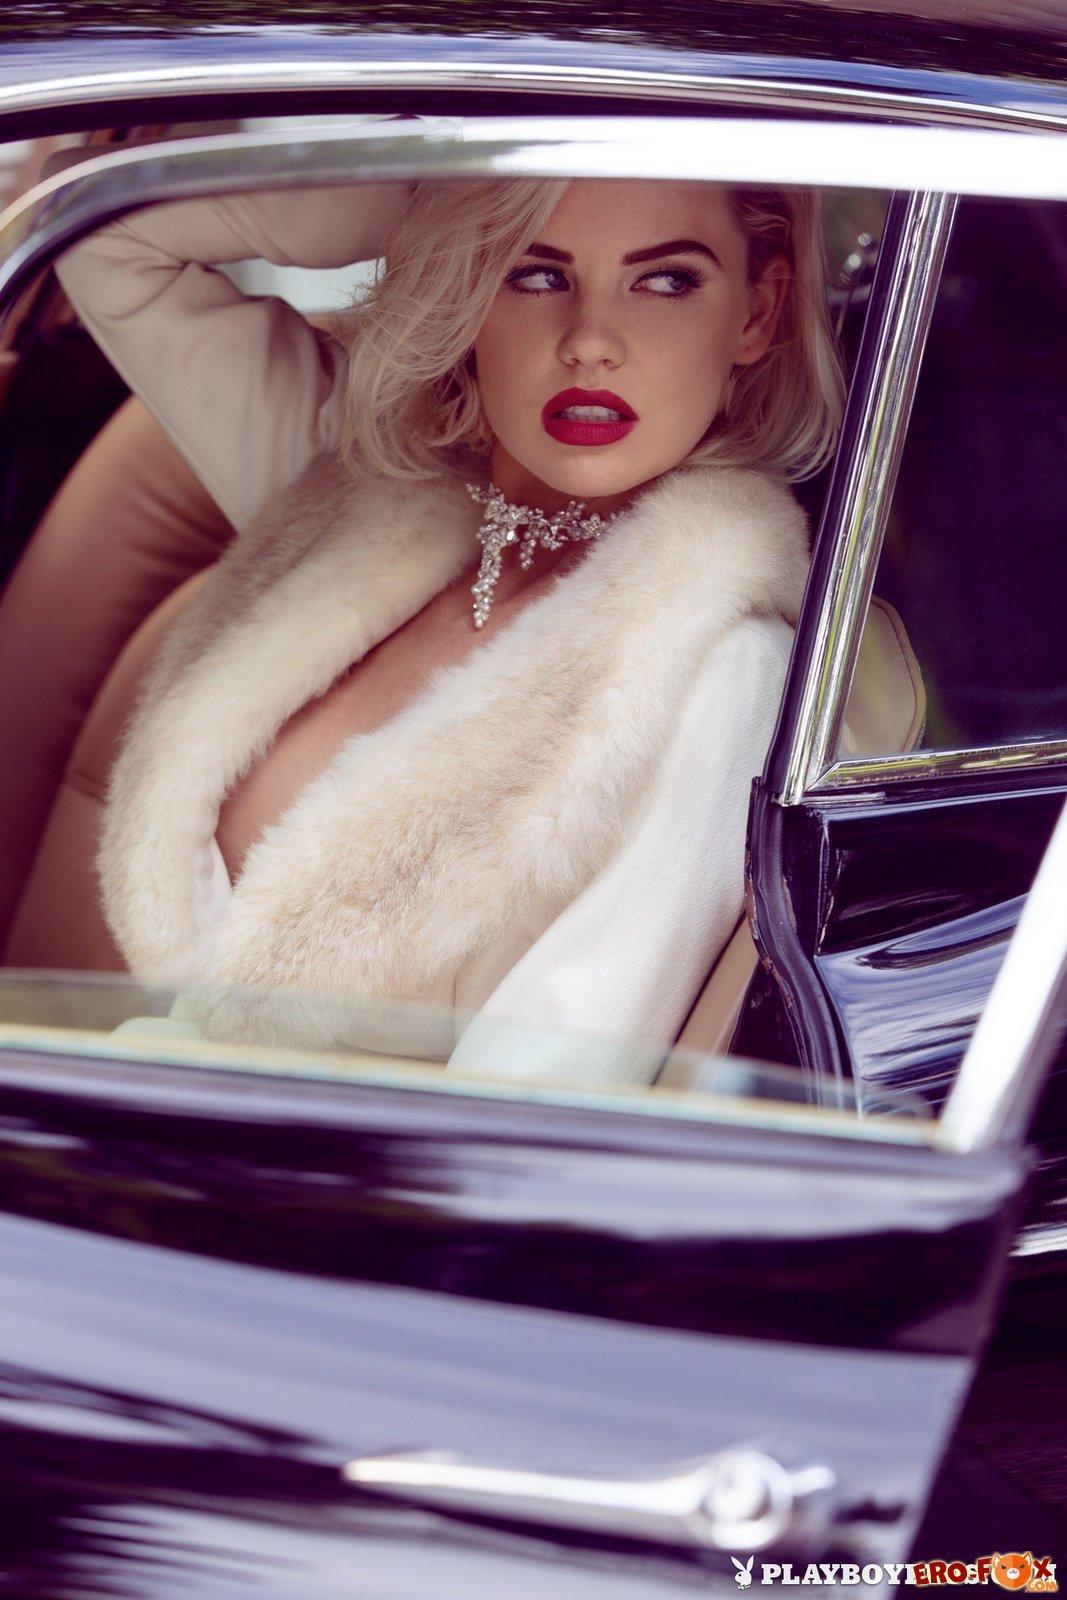 ретро эротика в старом автомобиле - фото блондинки PlayBoy.